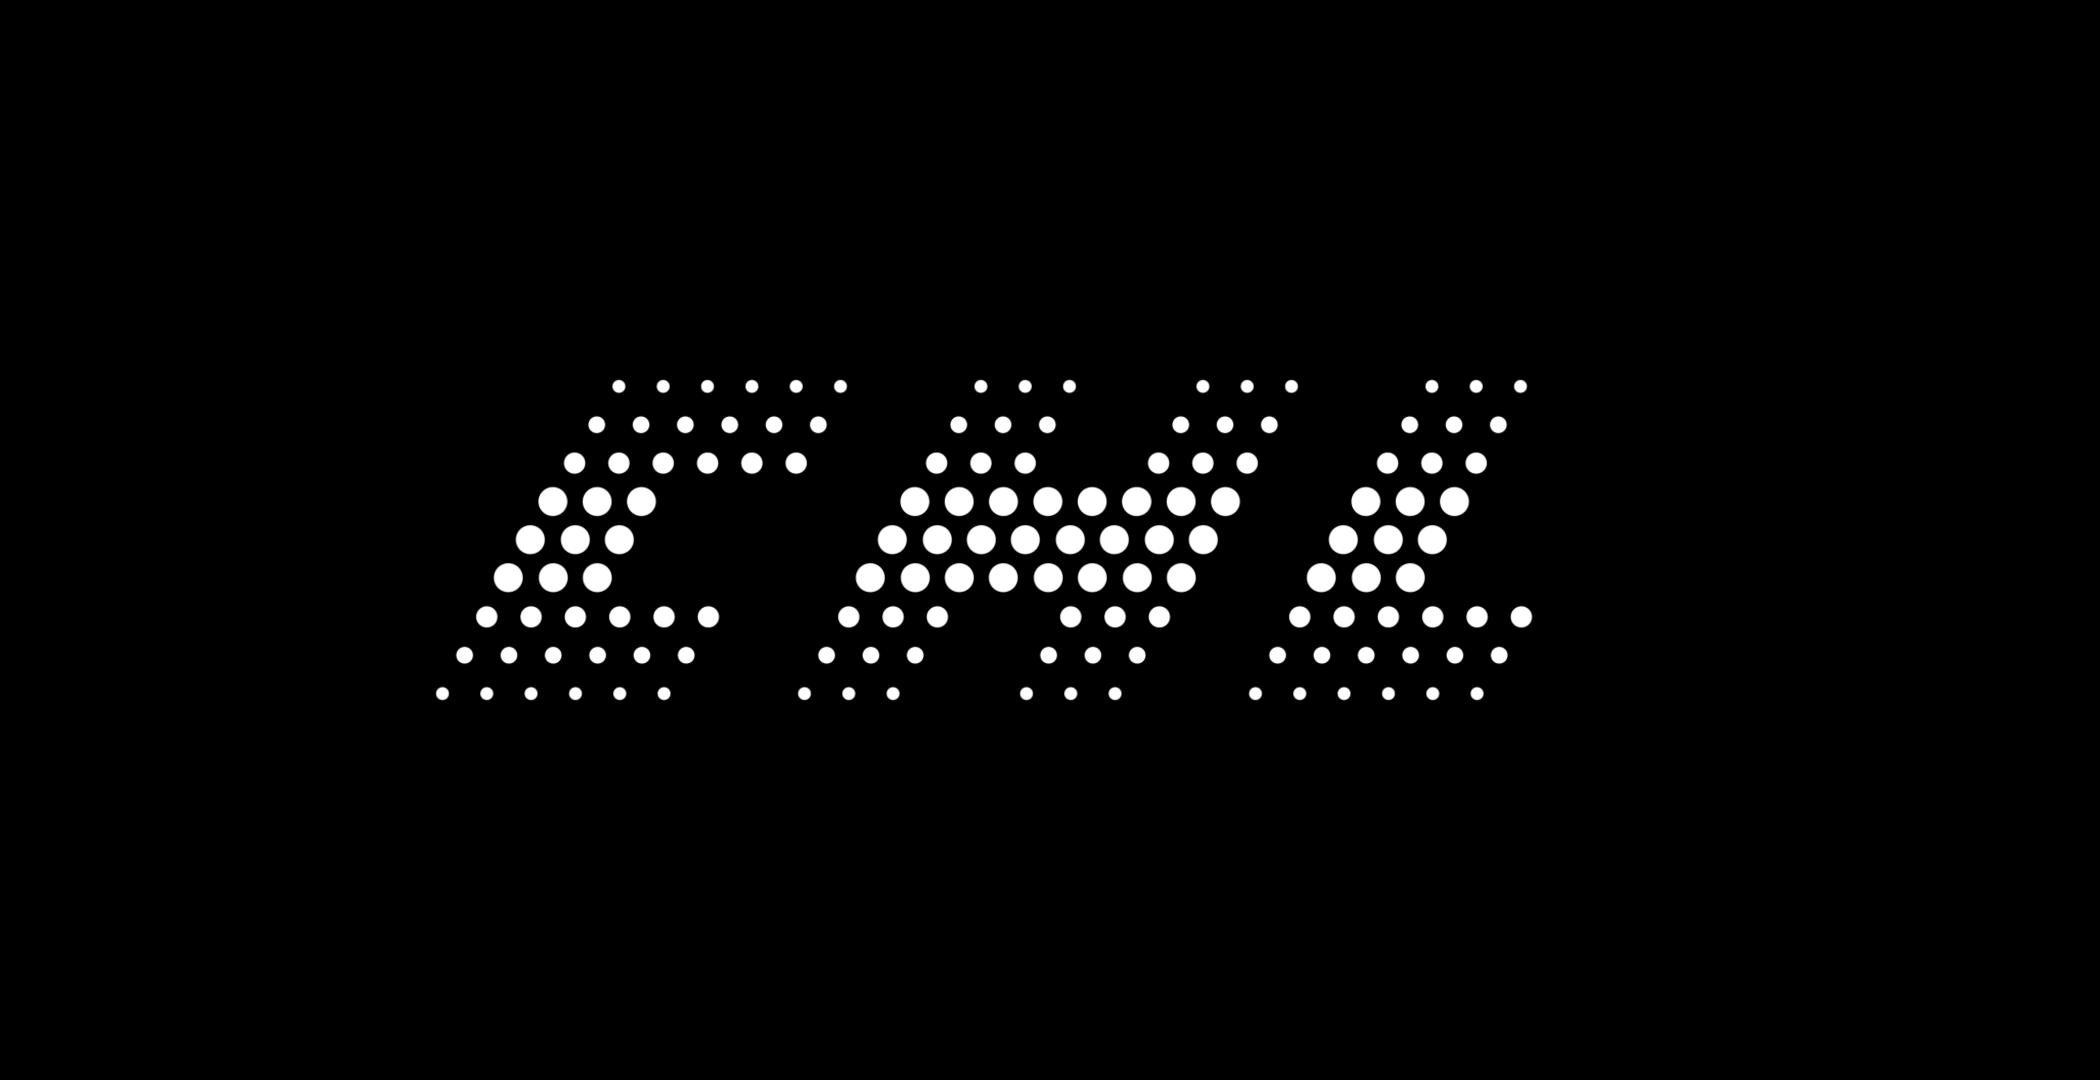 разработка логотипа для производителя фар фото f_3445f5dad393ce72.png